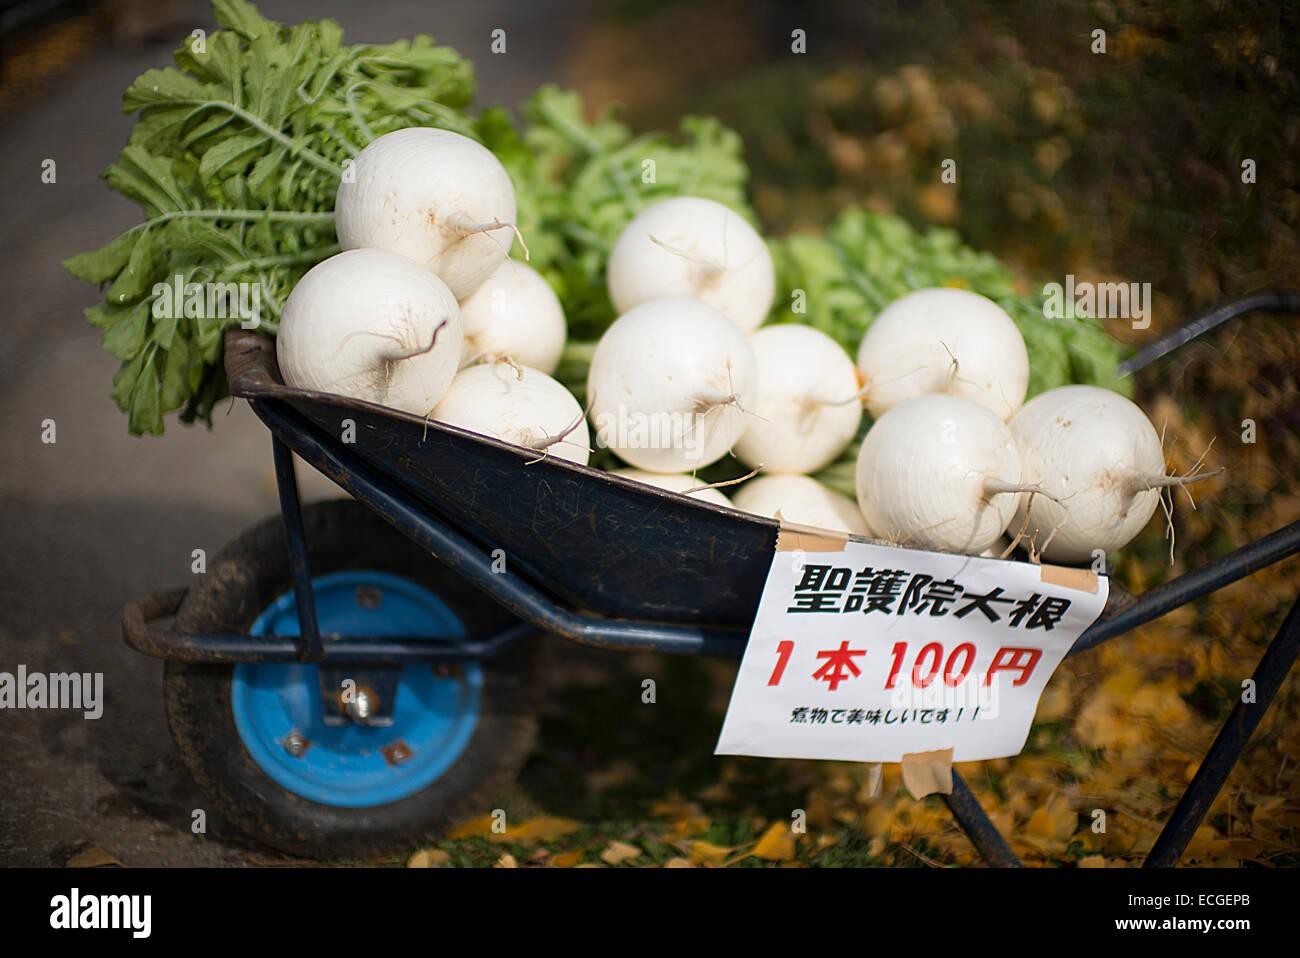 Japanese white radish vegetables in a wheelbarrow. - Stock Image